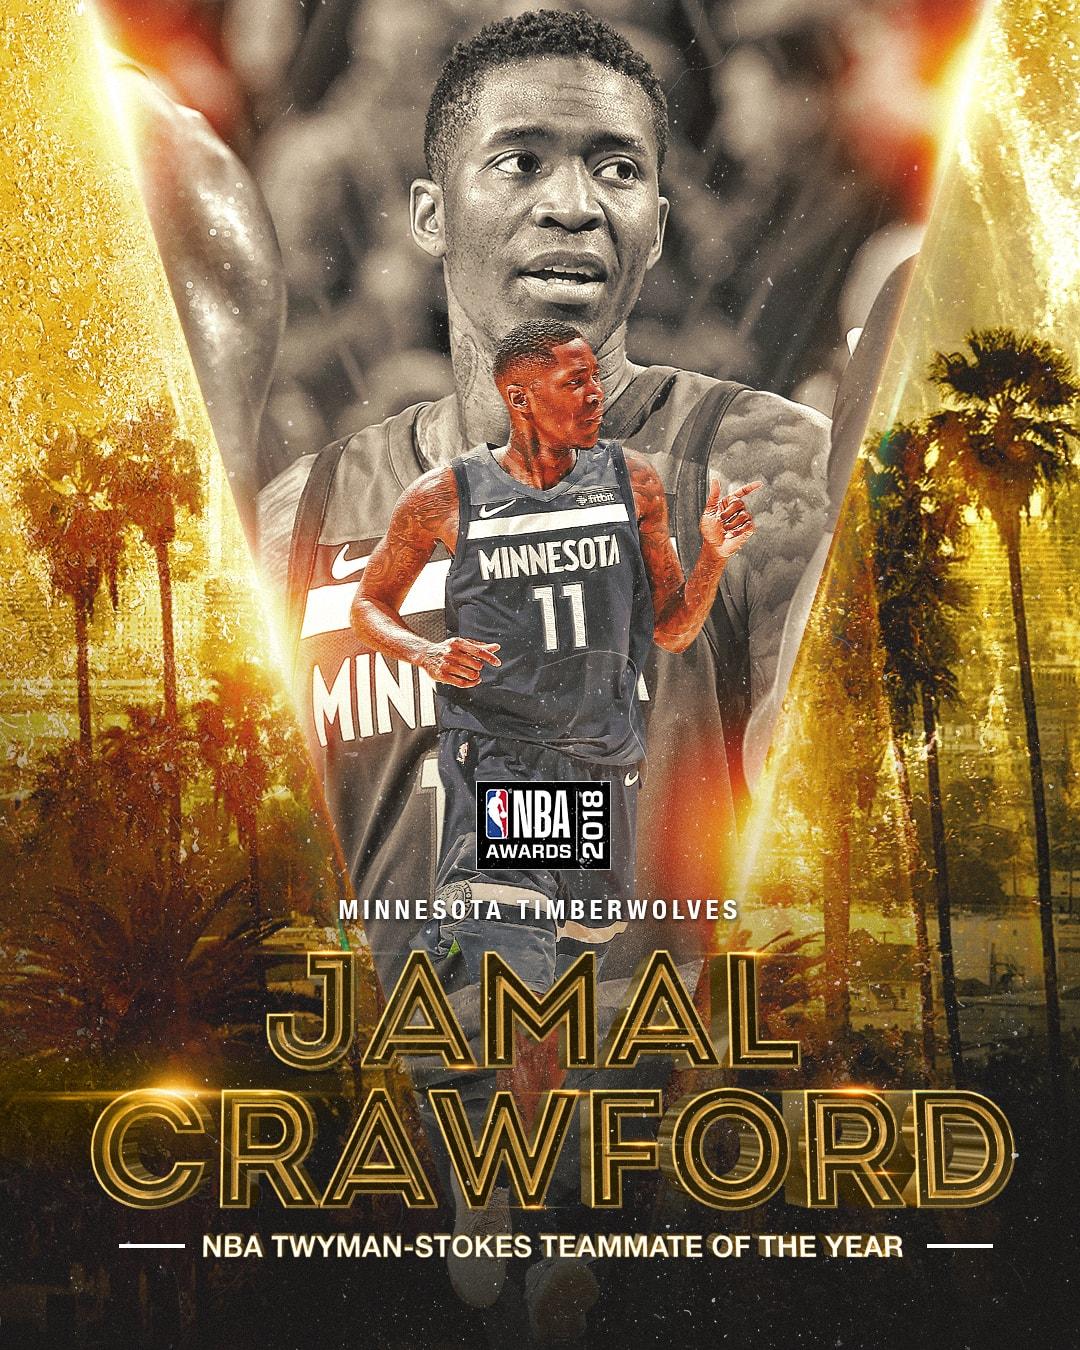 2018 NBA Awards NBA Twyman-Stokes Teammate of the Year Award Jamal Crawford